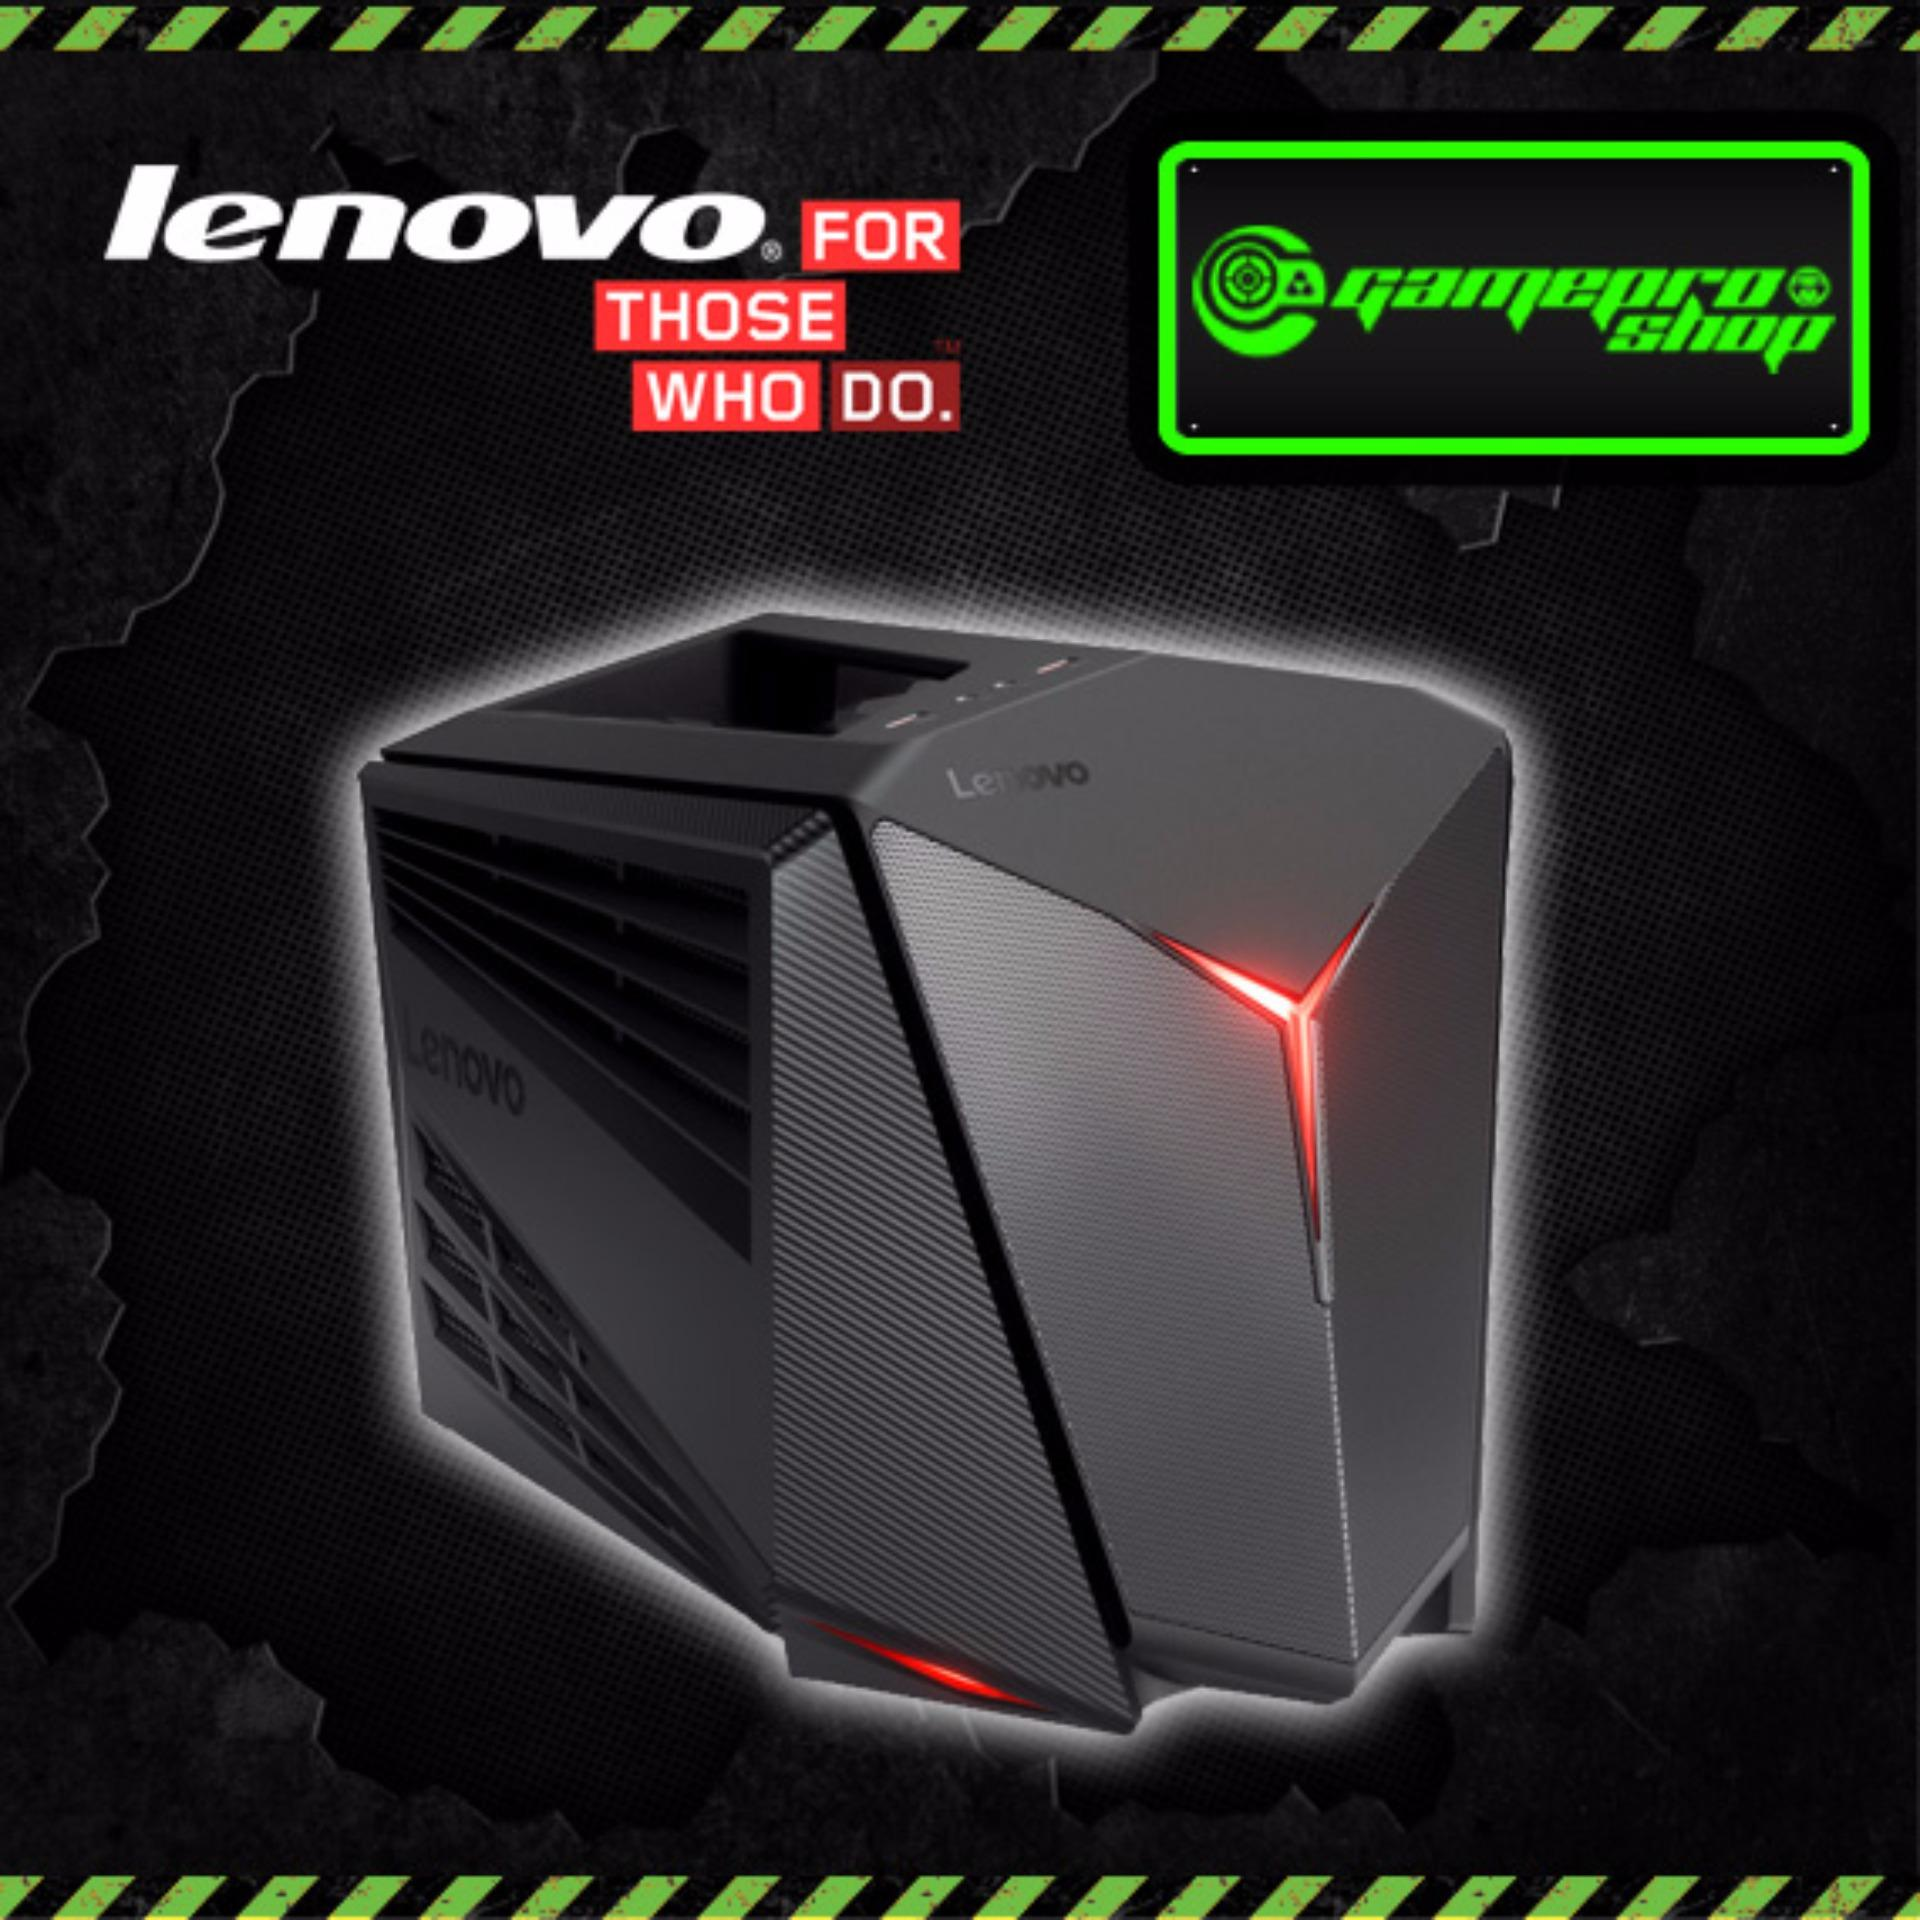 Lenovo ideaCentre Y710 Cube-15ISH i7-6700HQ 32GB (GTX1080) *NDP PROMO*